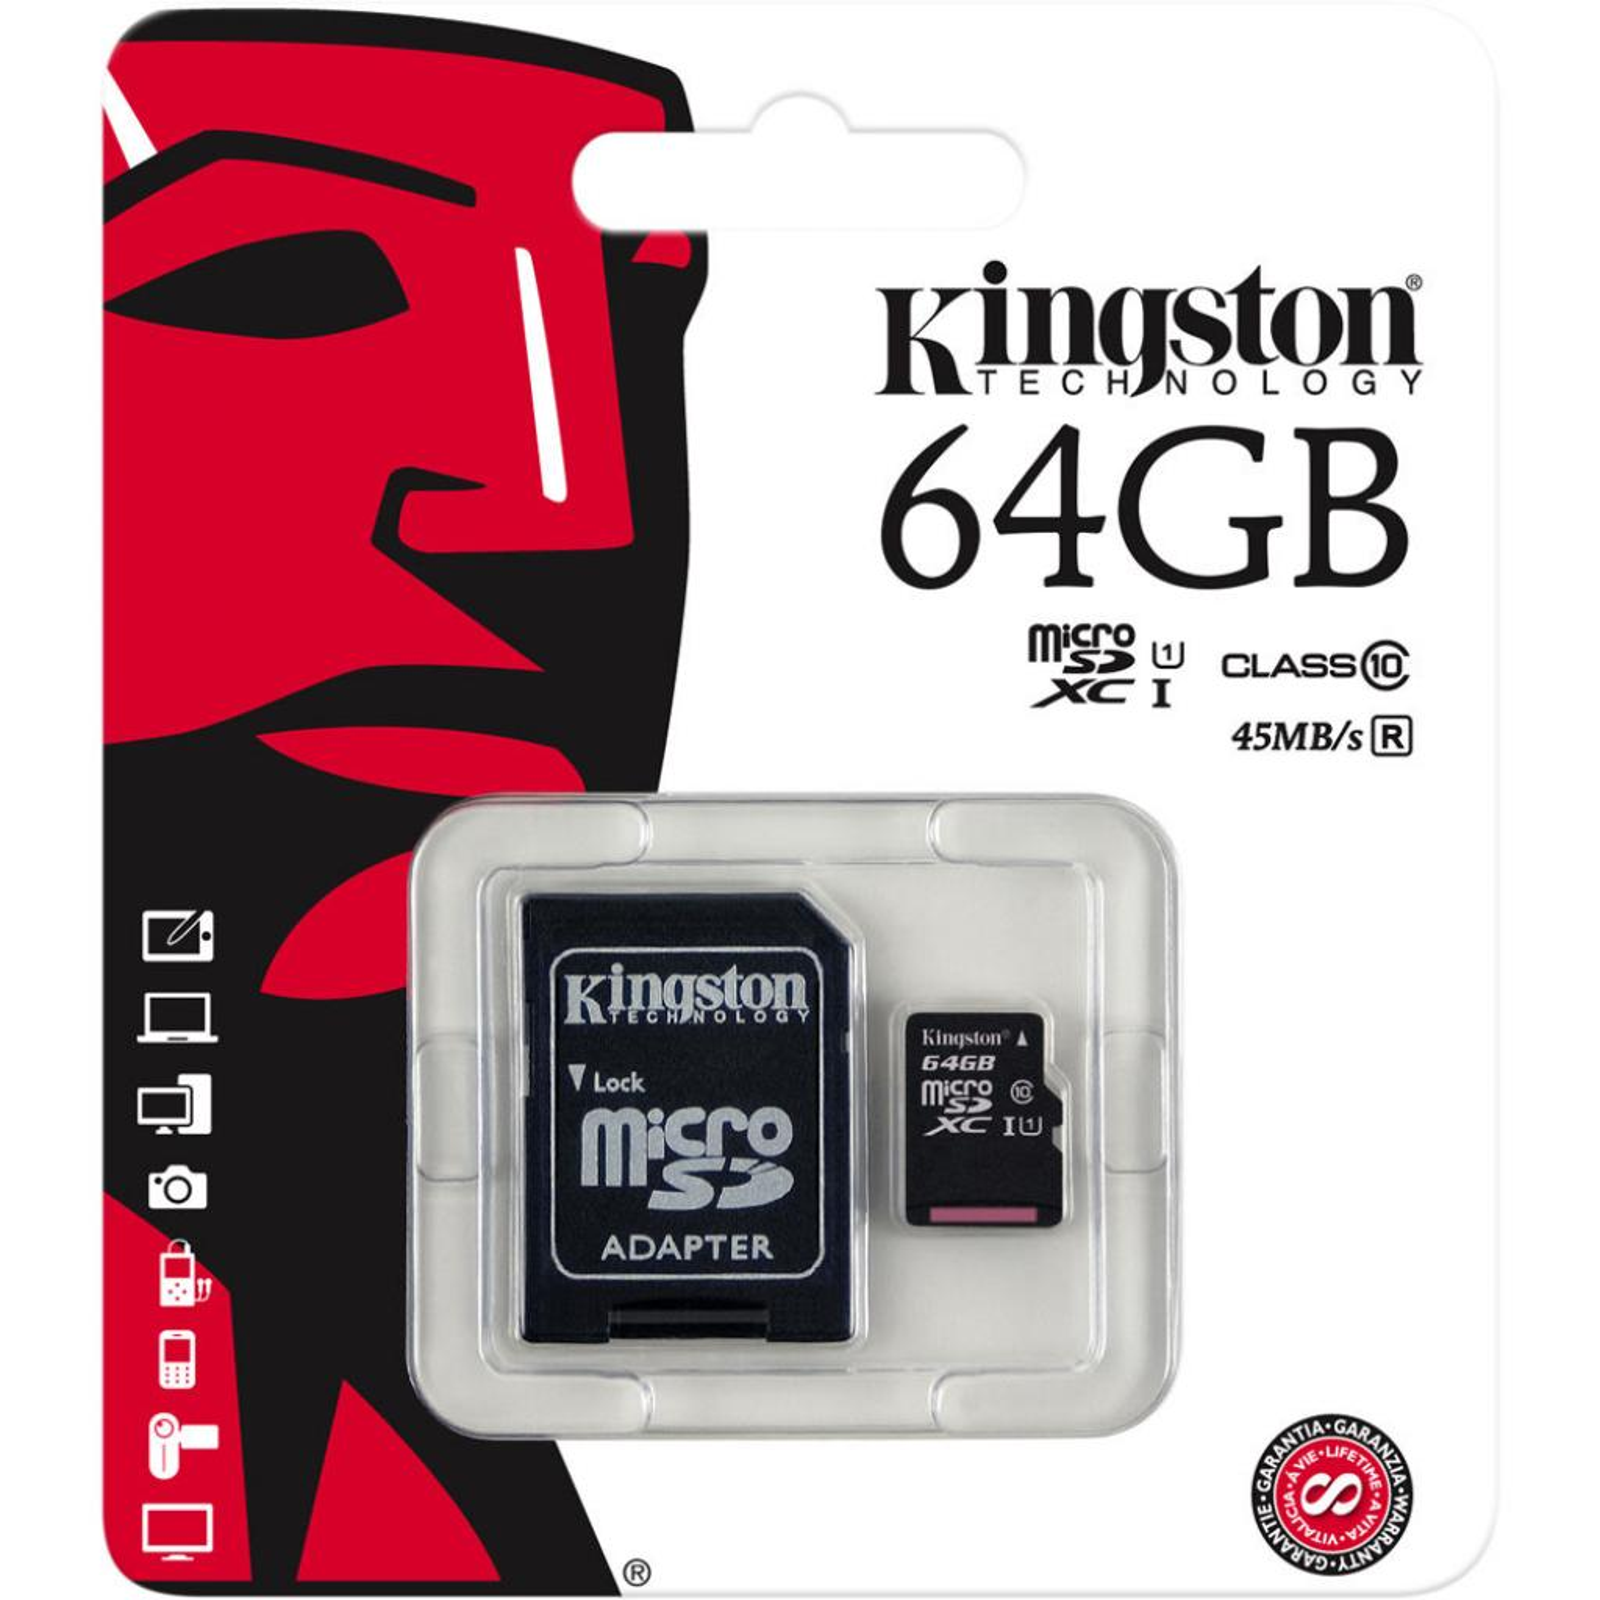 Карта памяти Kingston 64GB microSDXC Class 10 UHS-I (SDC10G2/64GB) изображение 3